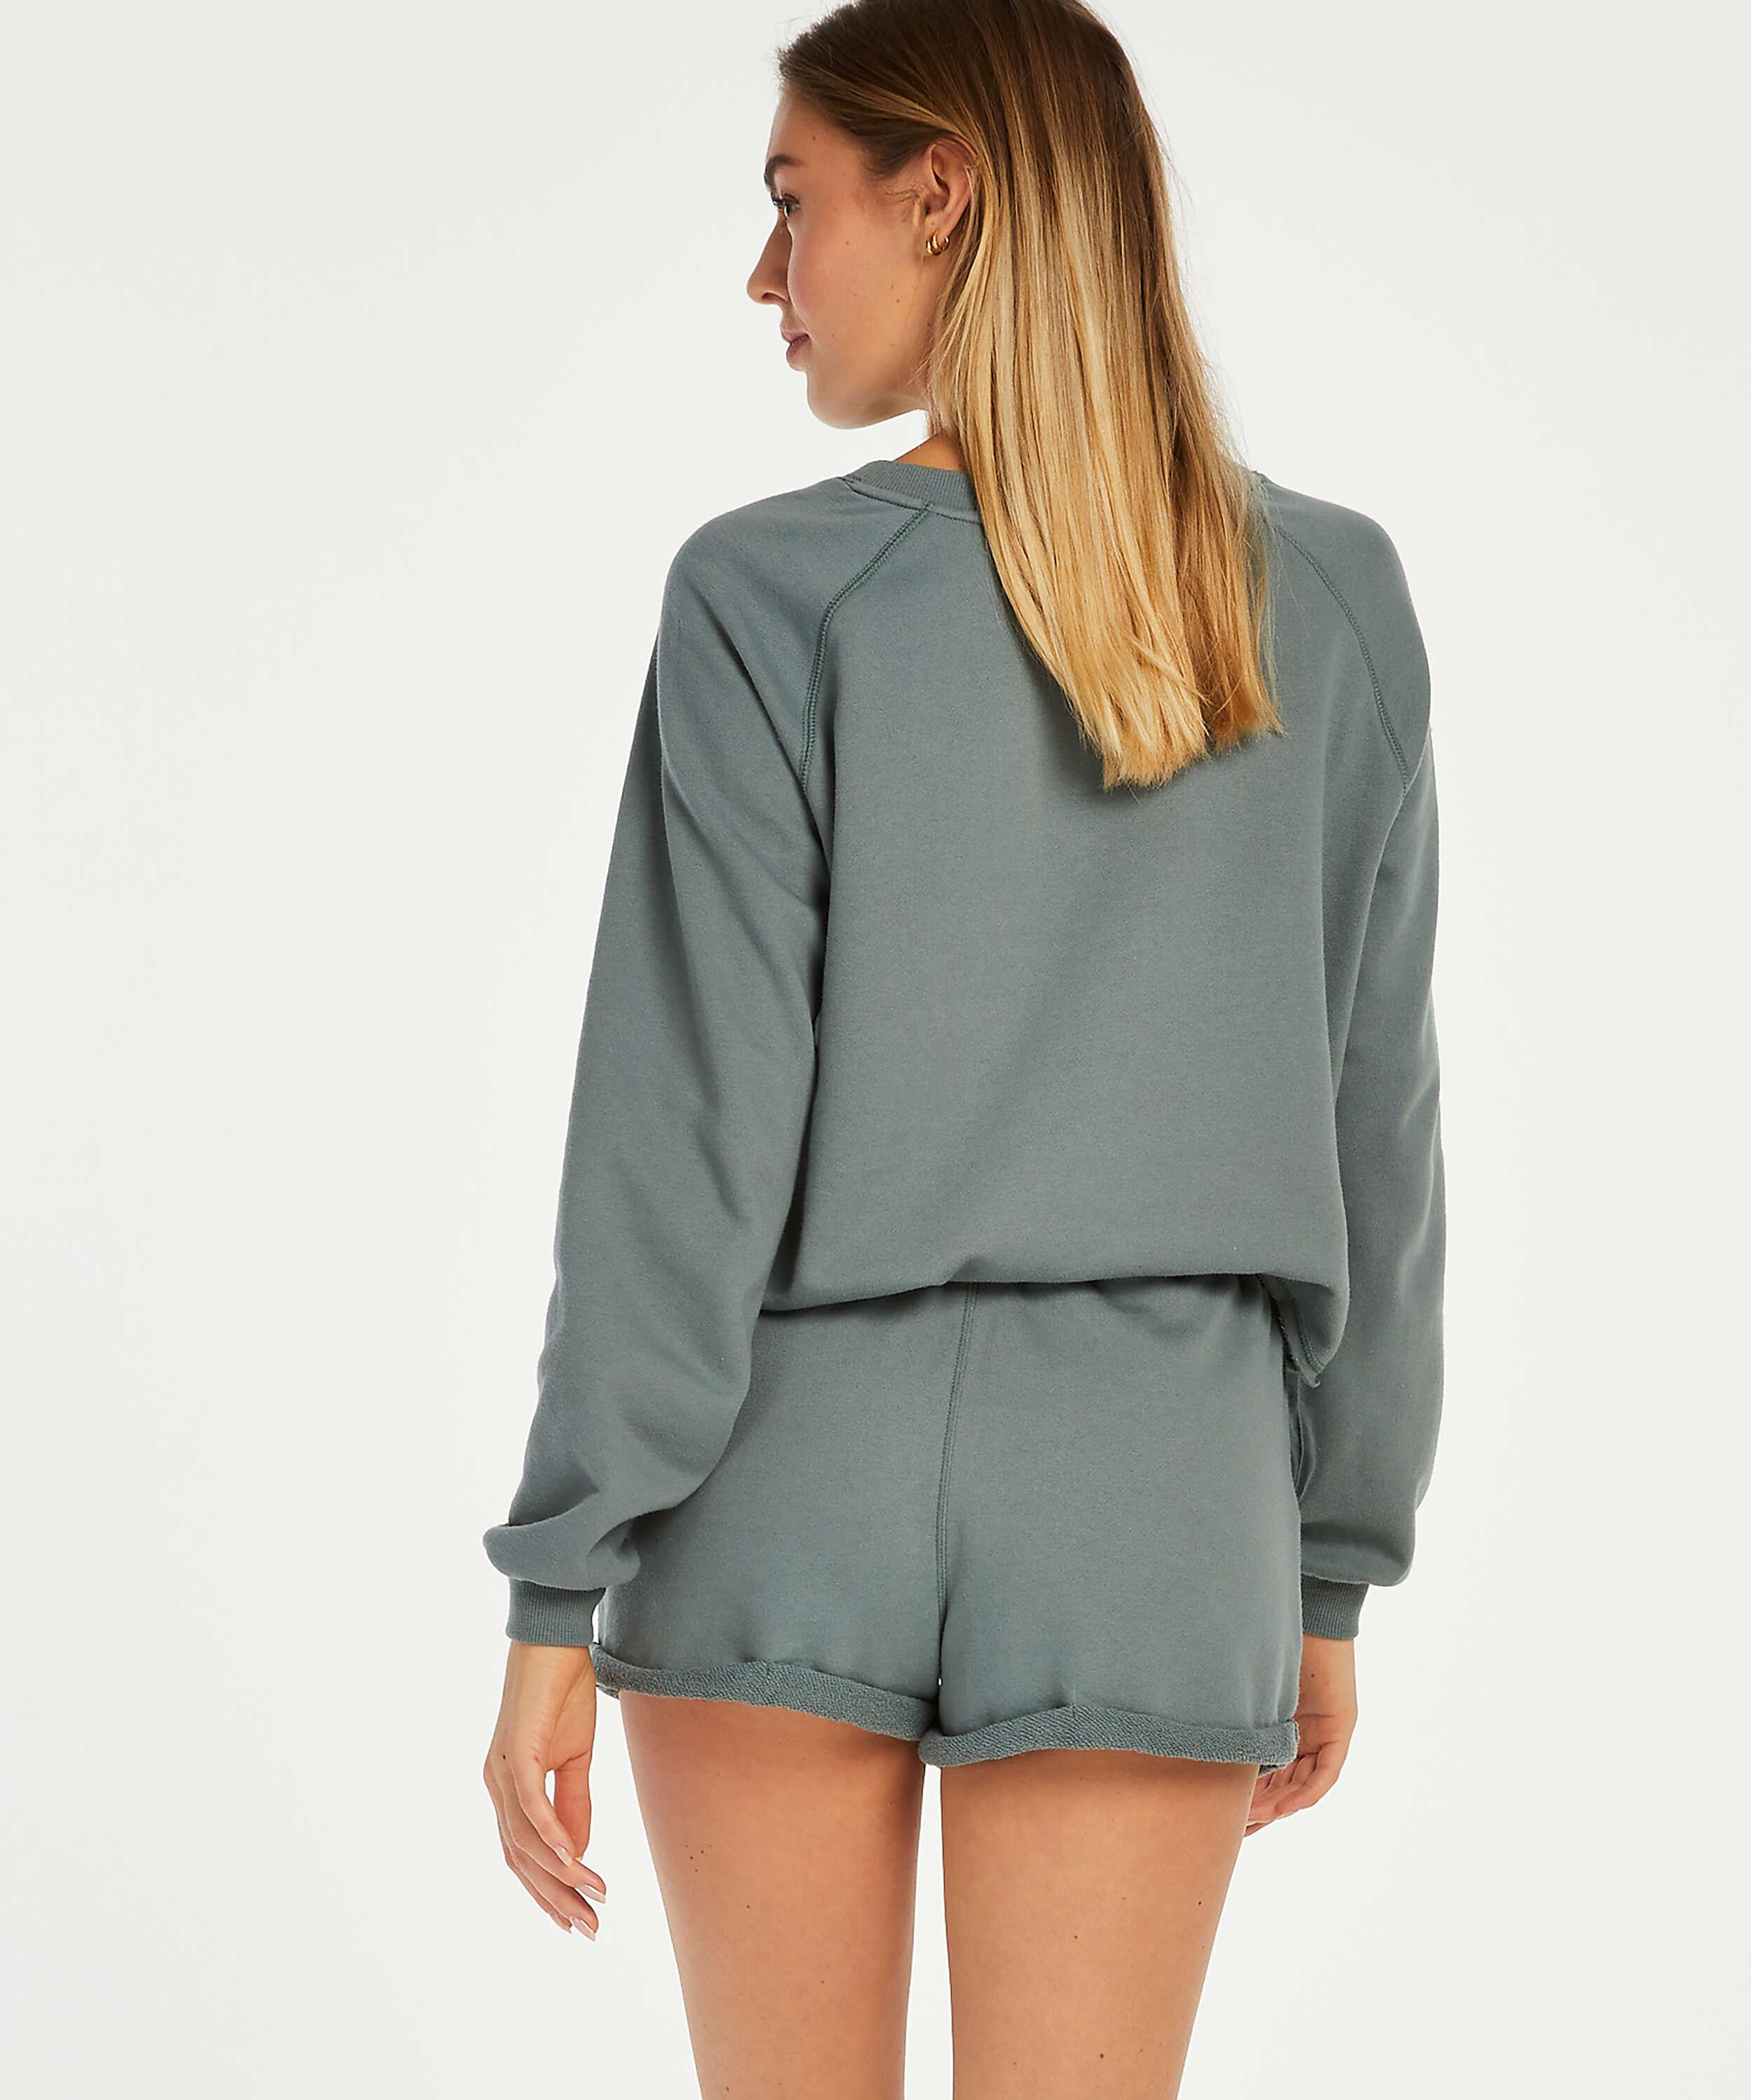 Sweat French Shorts, Green, main